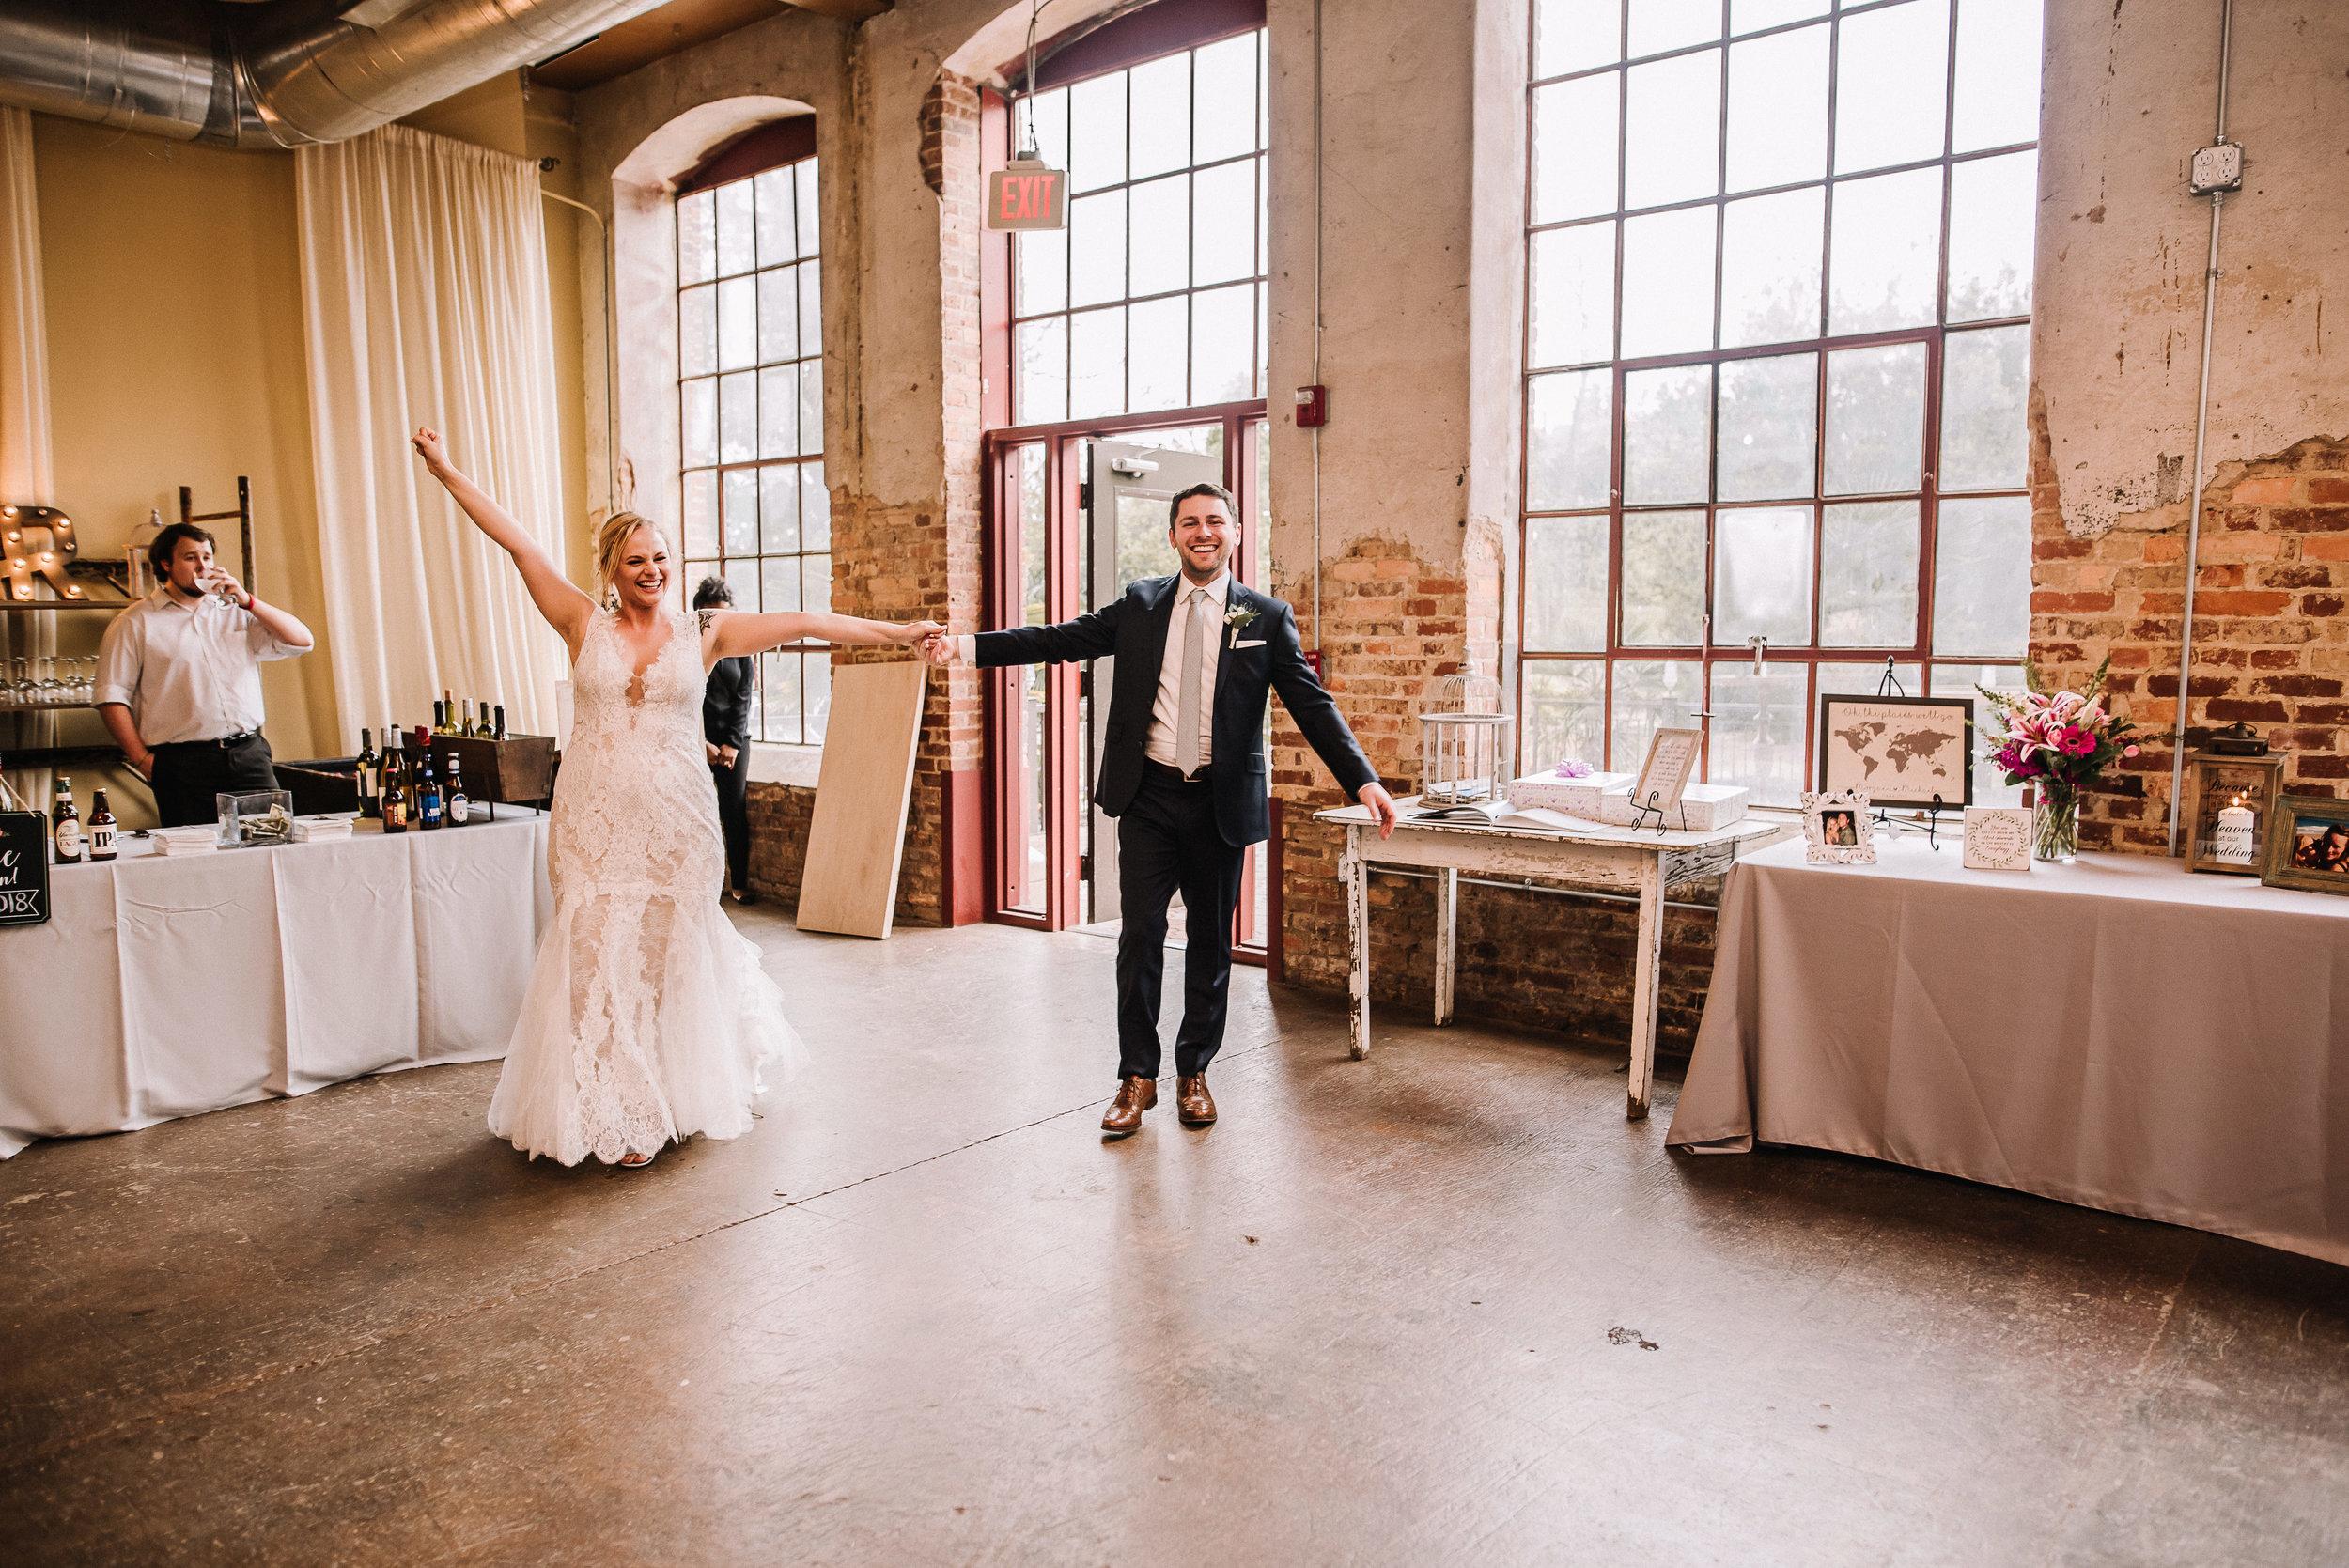 Morgan Wedding_Mill at Yellow River_Ashley Benham Photography-974.jpg